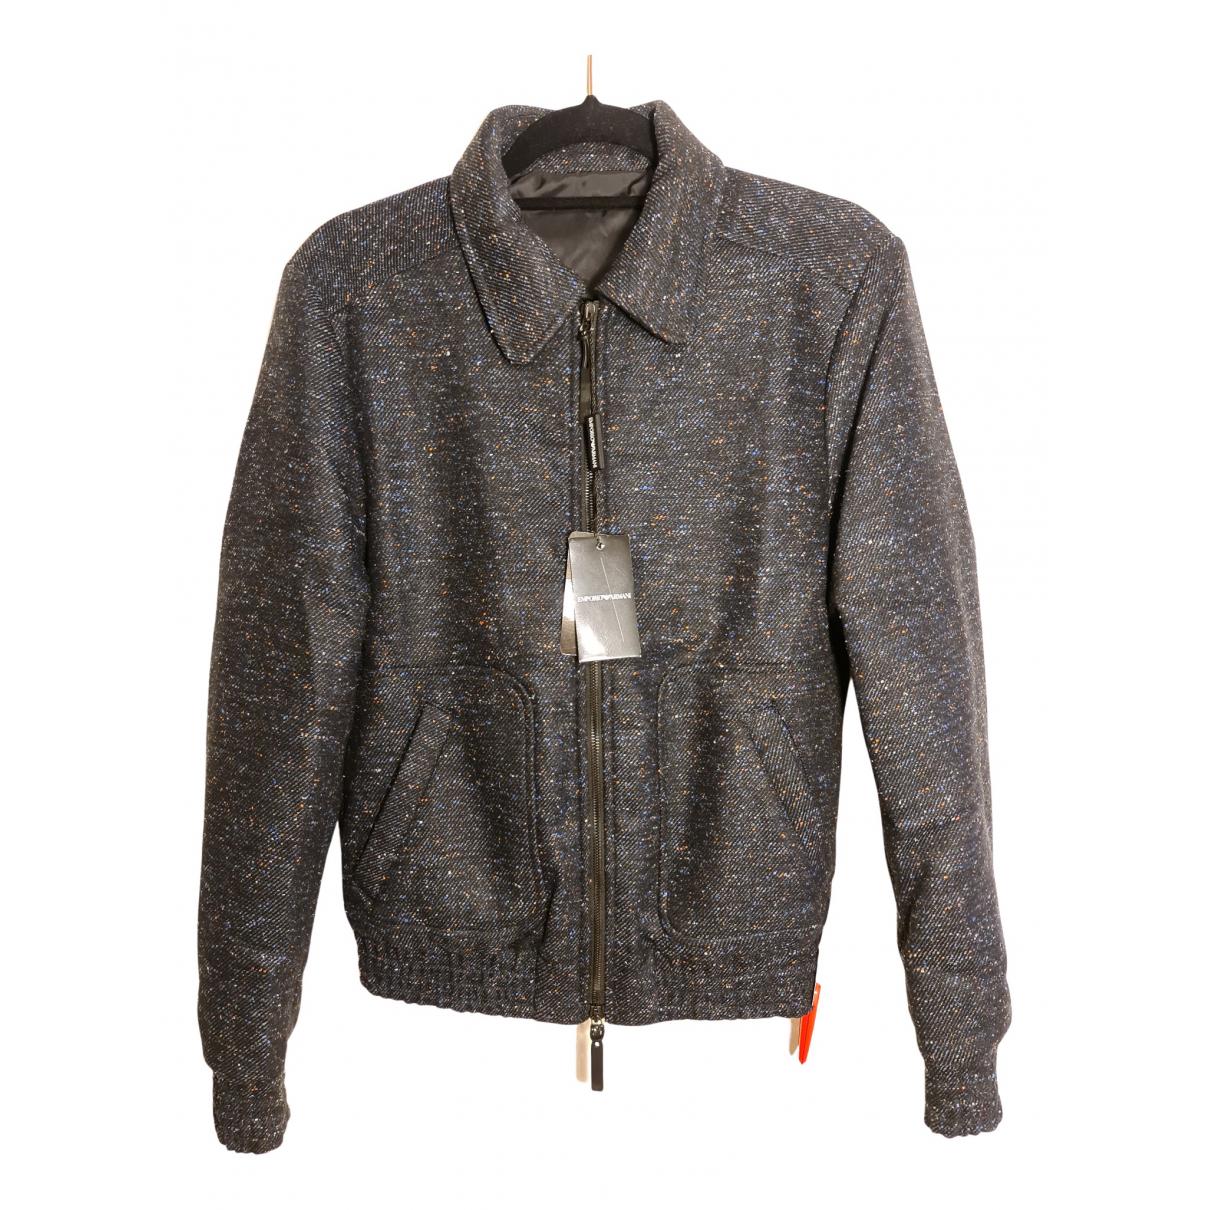 Emporio Armani \N Black jacket  for Men S International